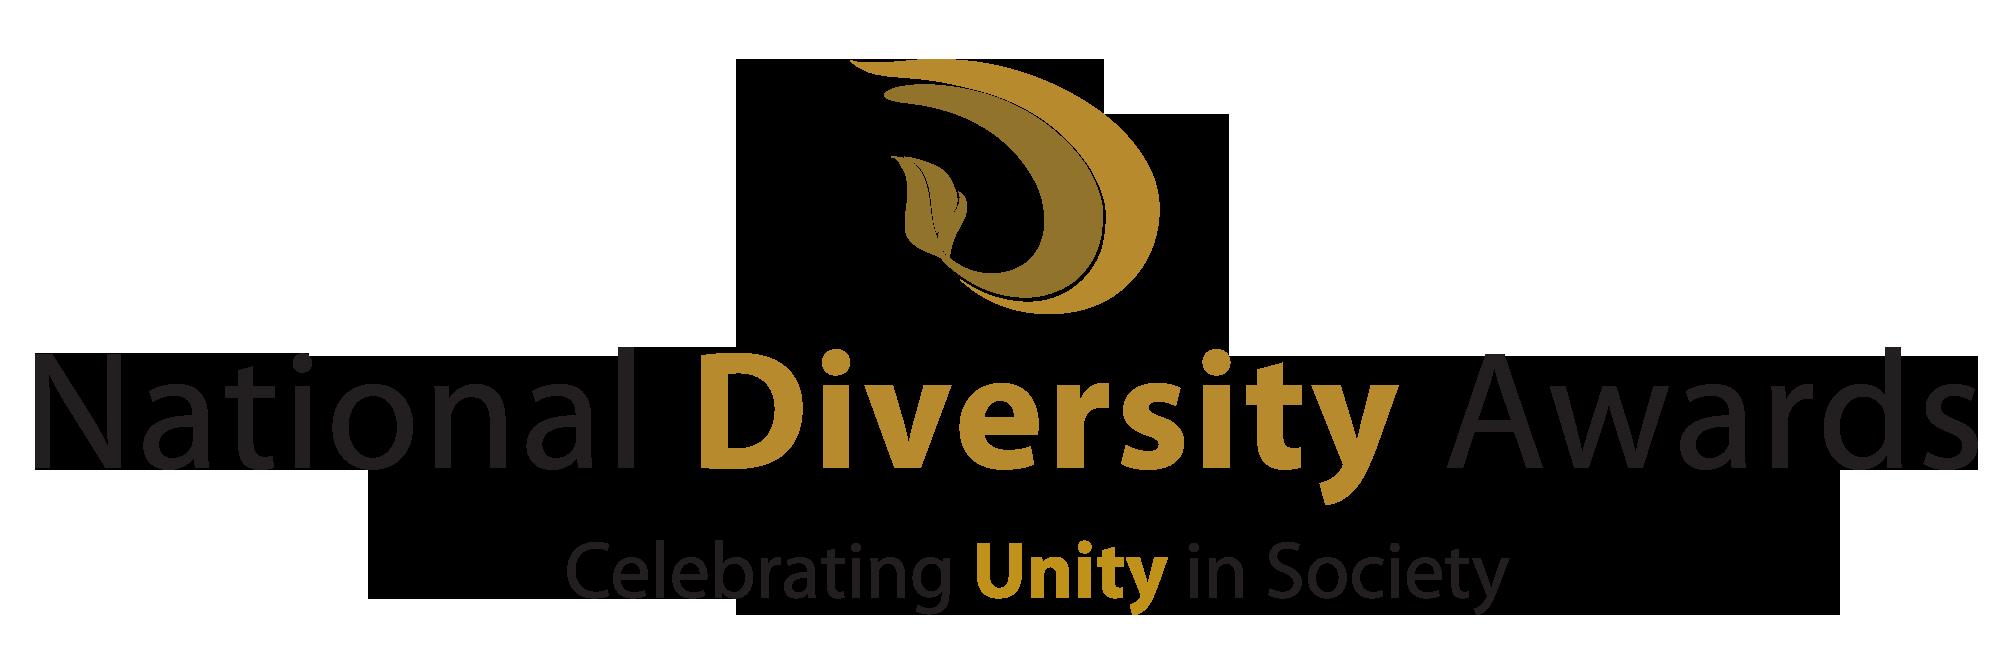 National Diversity Awards logo